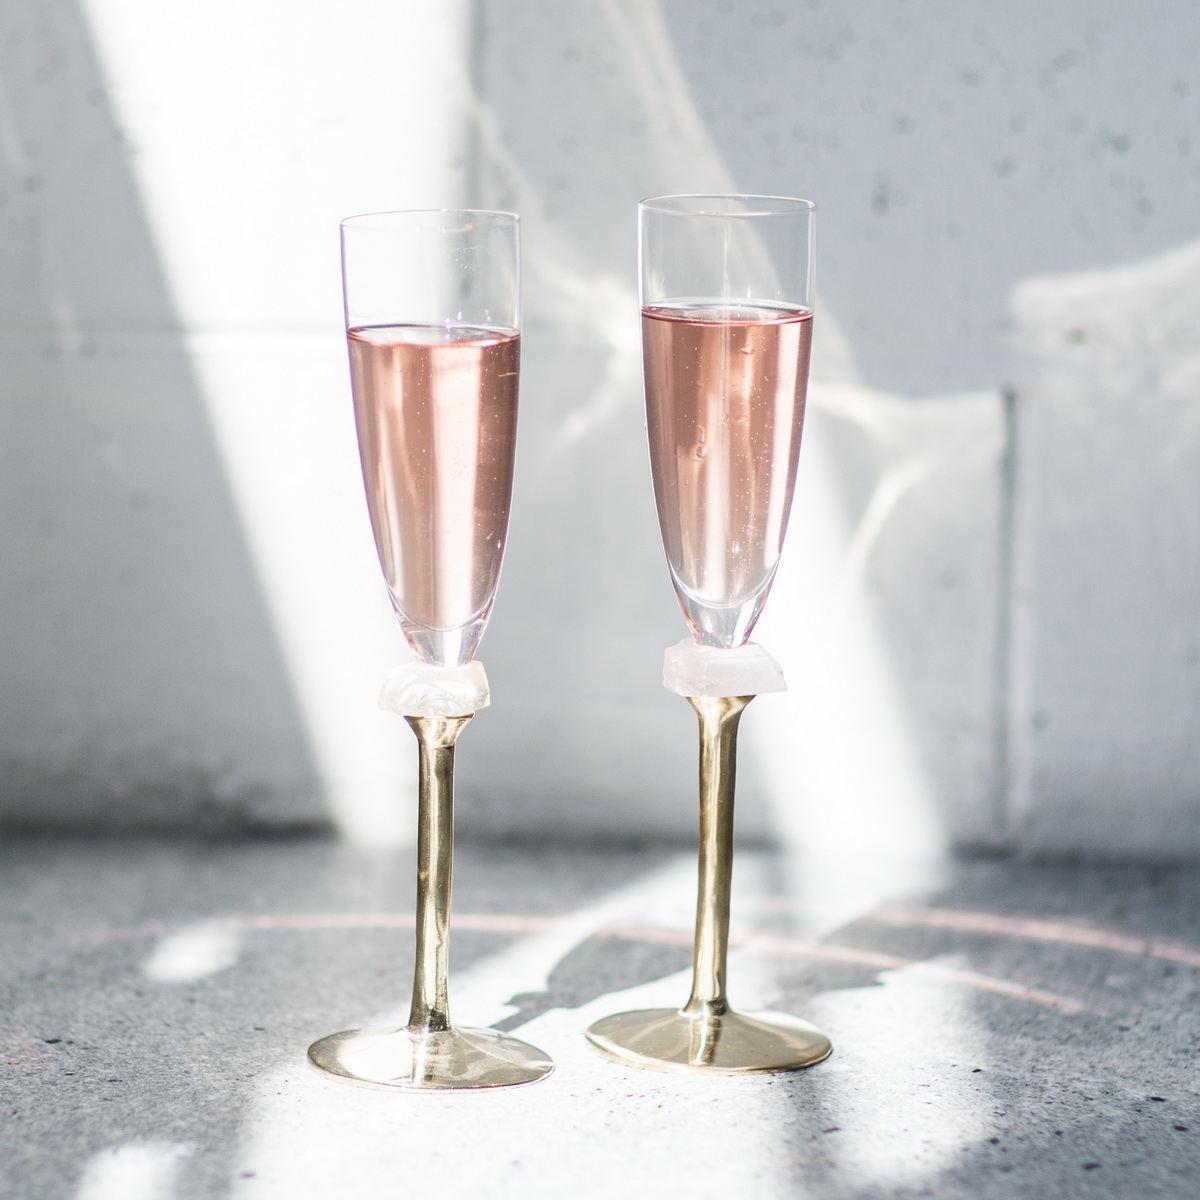 Annavasily Gaby 2pcs Modern Champagne Glasses On A Gold Stem Modern Champagne Glasses Gold Champagne Flutes Champagne Glasses